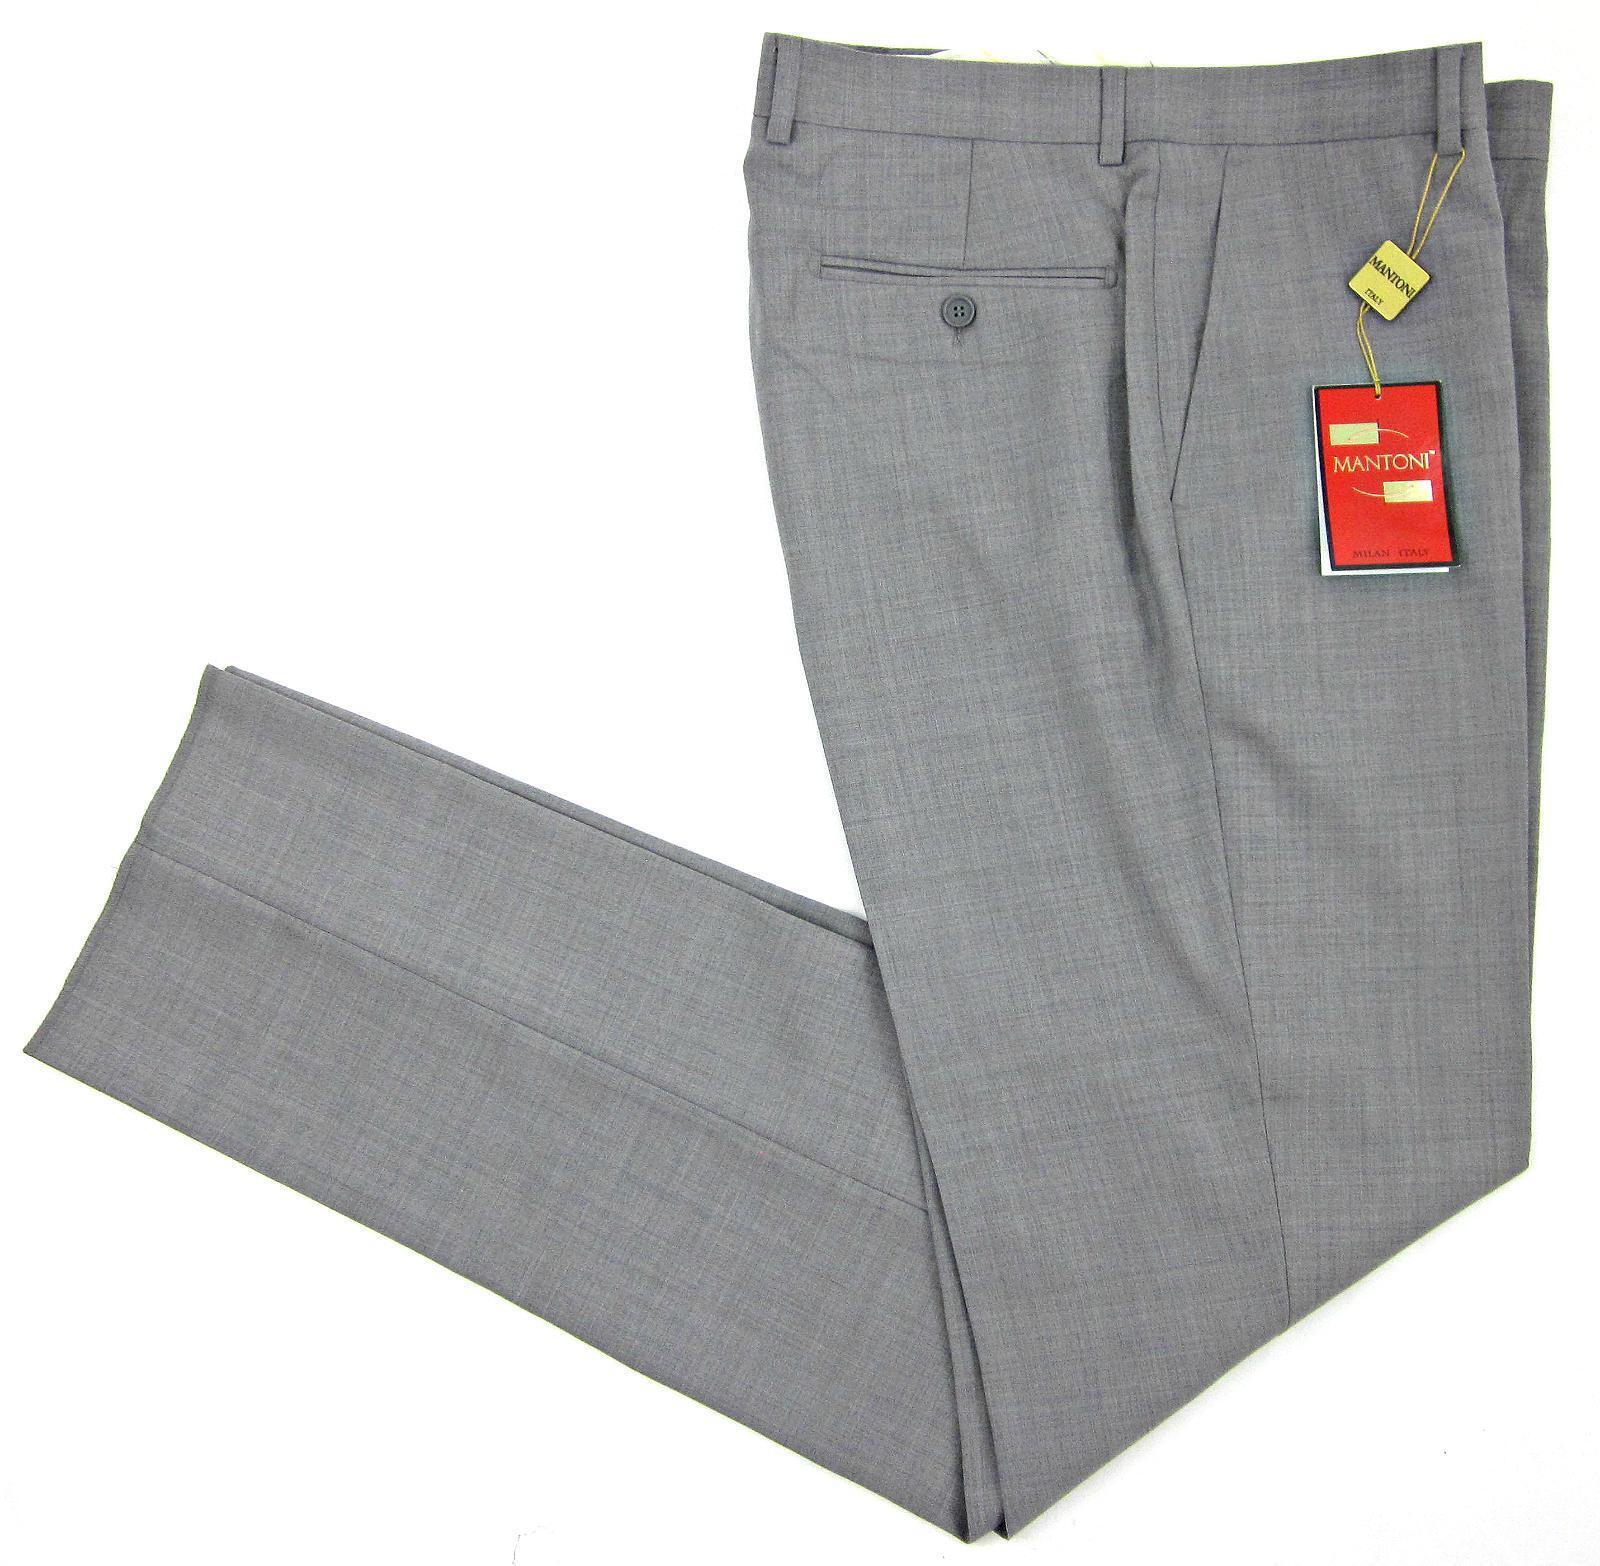 NEW  Mantoni Euro Slim Flat Front Wool Dress Pants Grey 36 Unhemmed